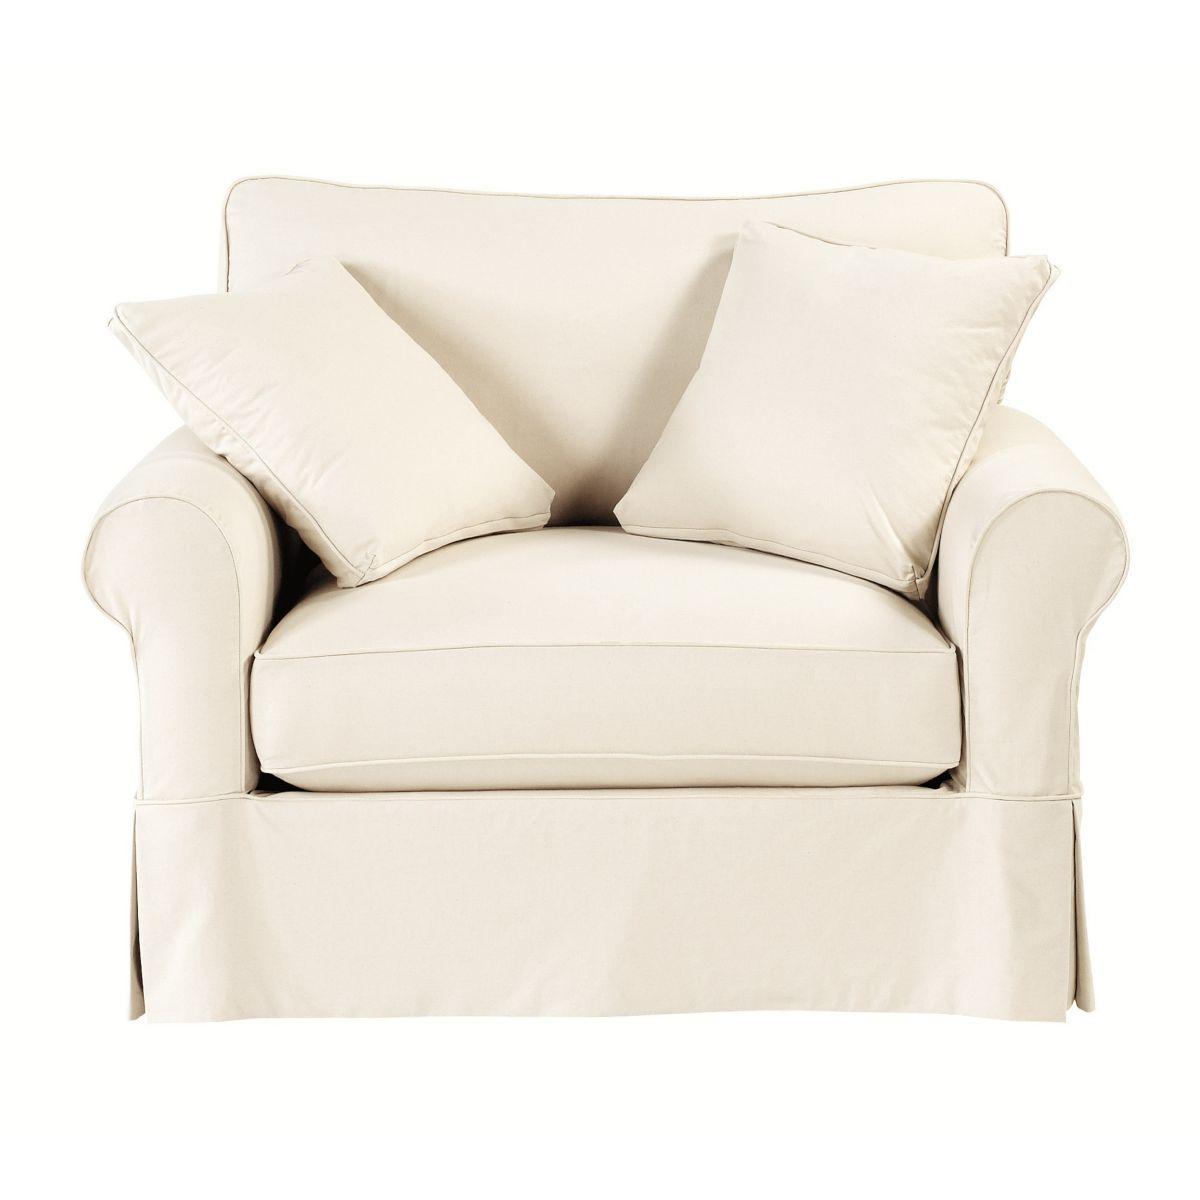 Baldwin swivel chair slipcover com ballard designs